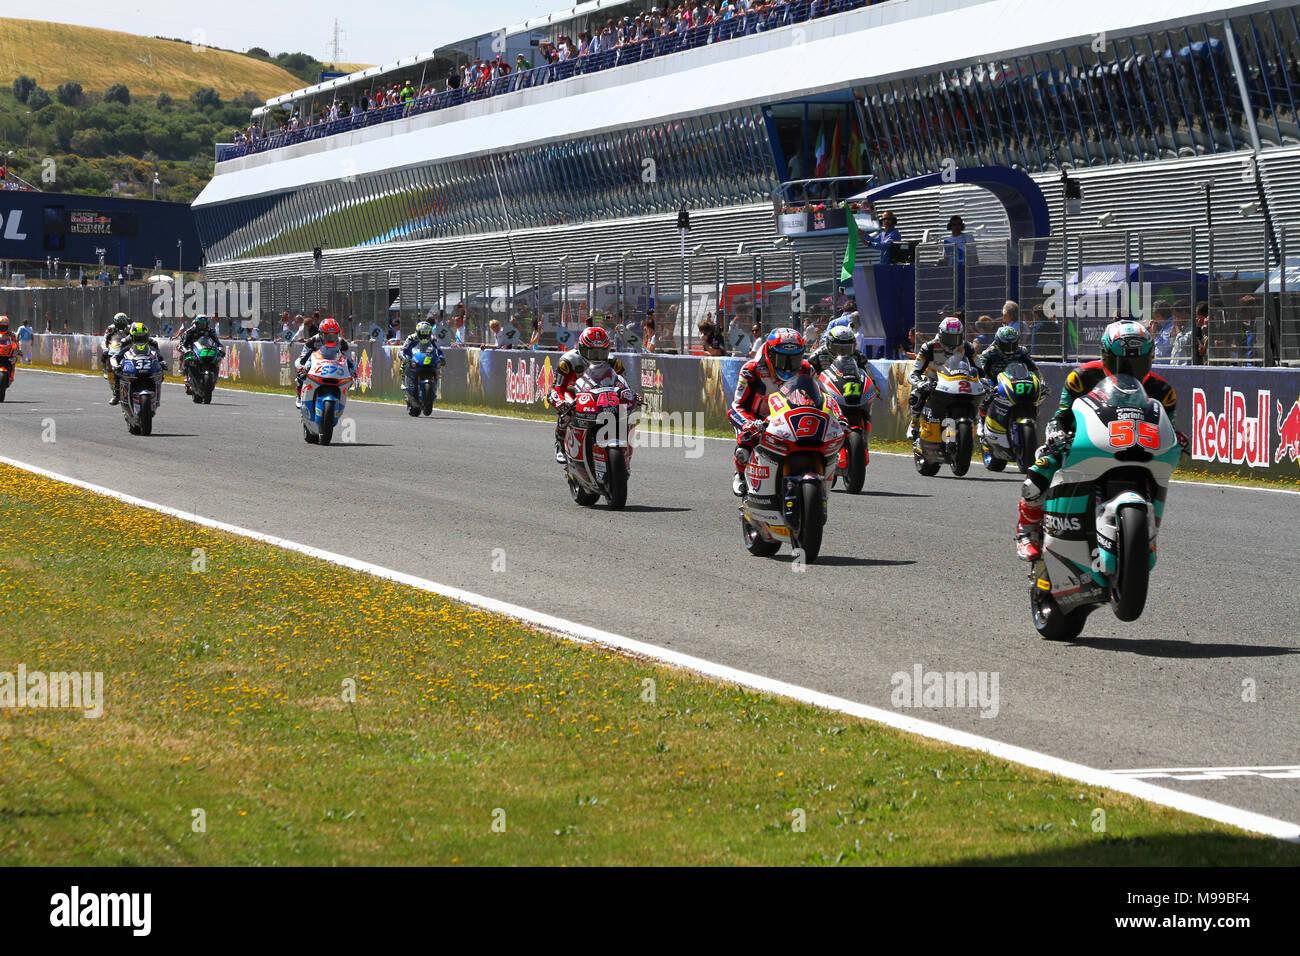 Star moto2 race at Jerez 2017 - Stock Image